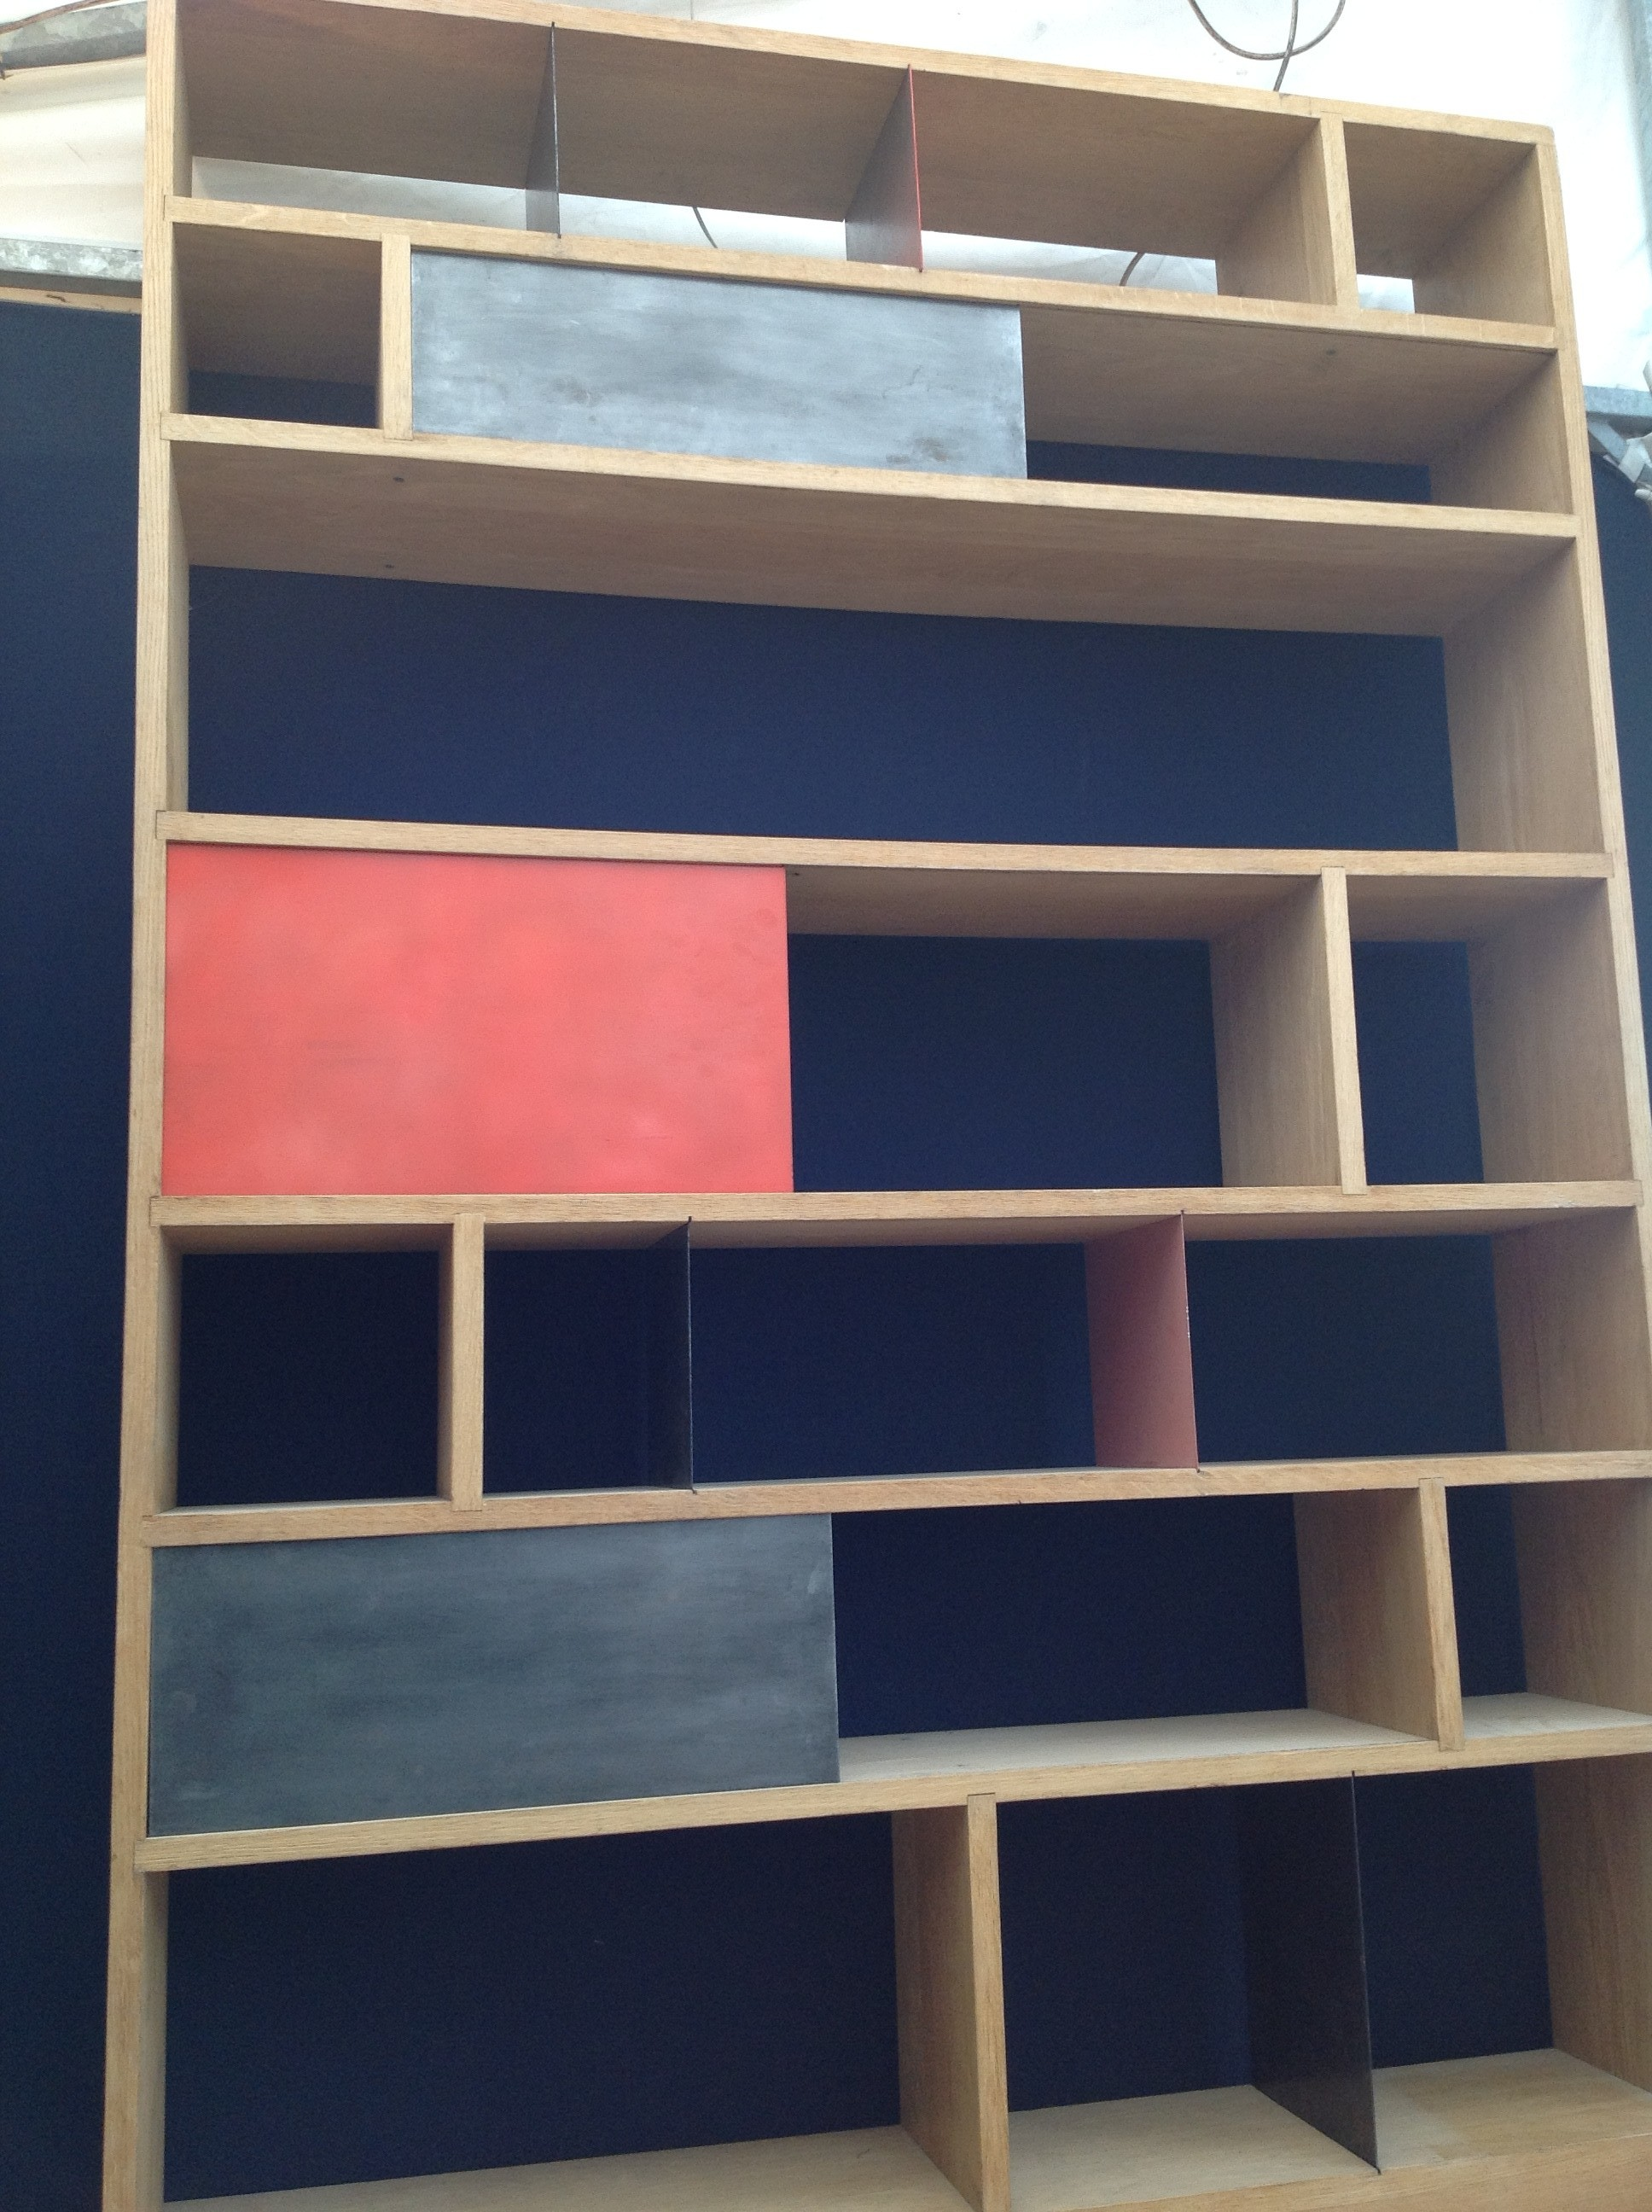 Atelier 154 bookcase in solid oak - 2000s - Design Market